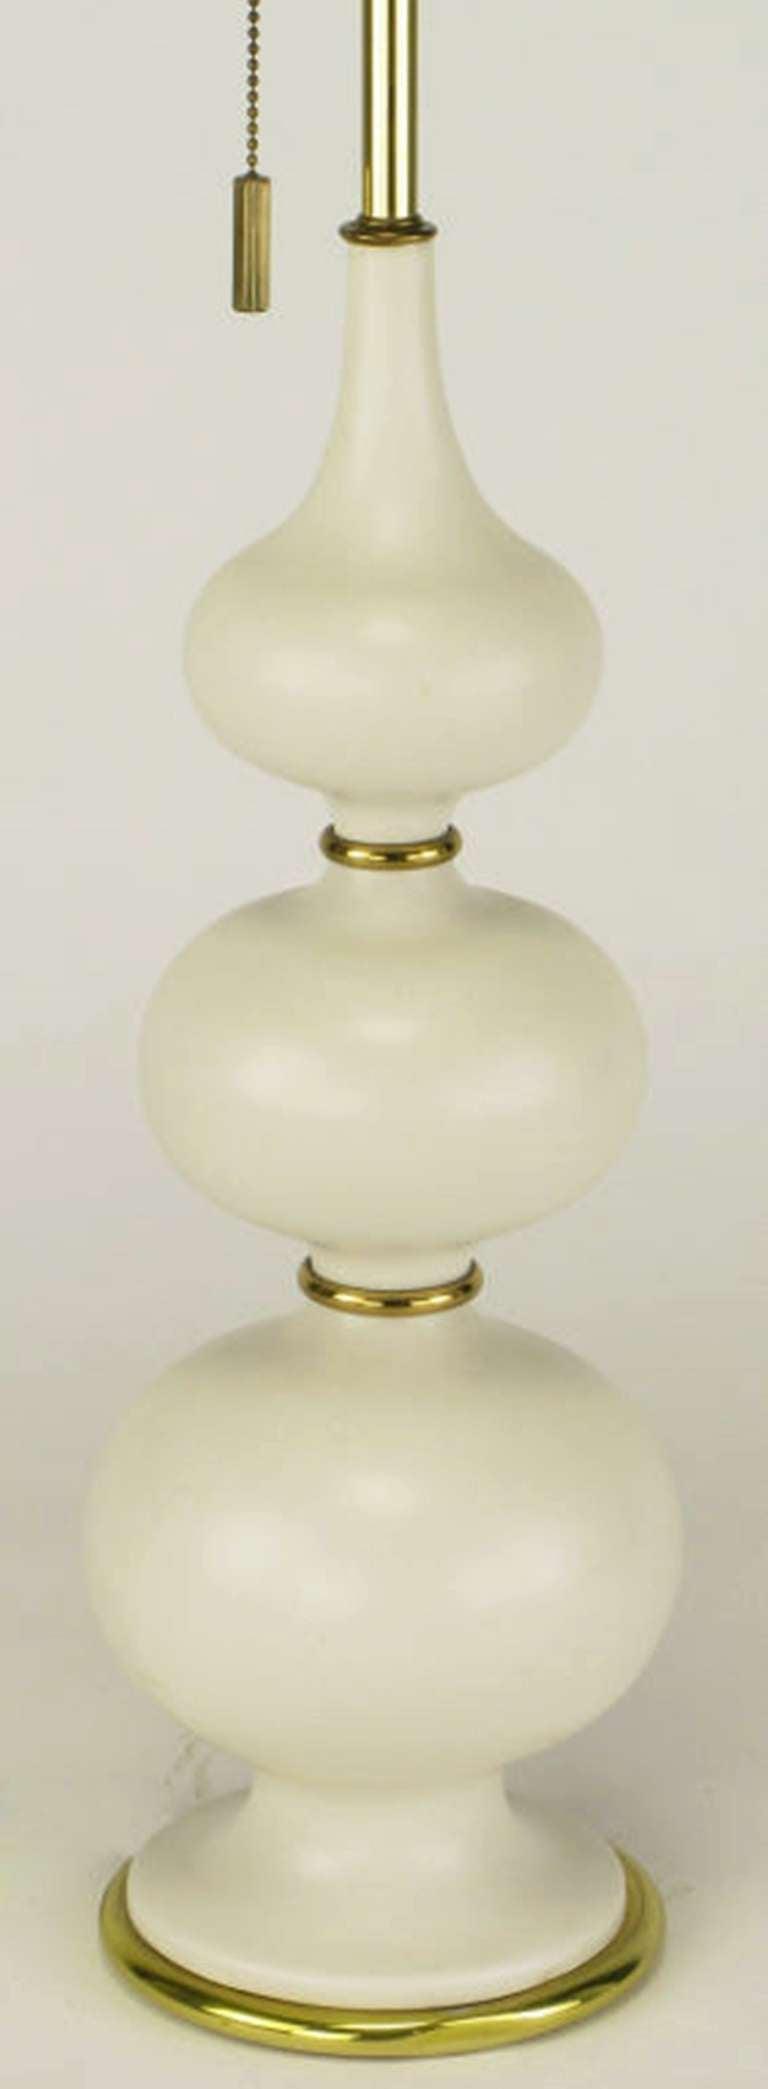 American Gerald Thurston for Lightolier Triple Gourd-Form Table Lamp For Sale